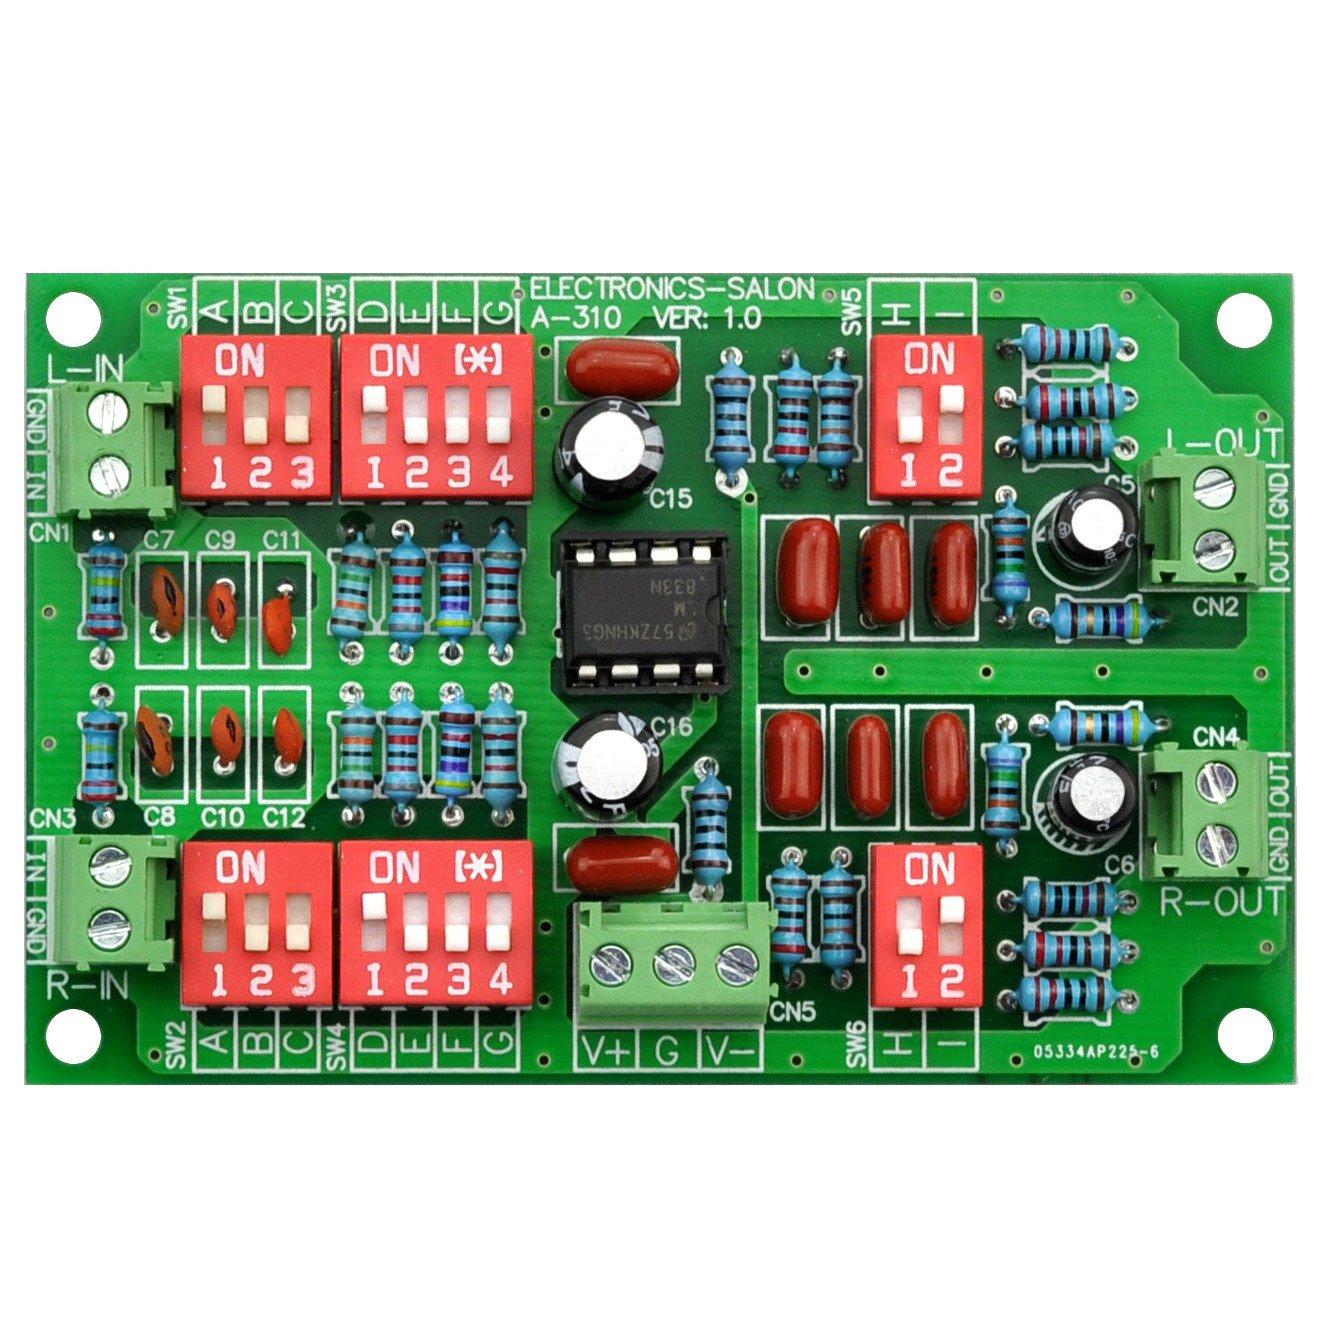 Electronics-Salon Stereo Phono RIAA Preamplifier Module Board, Preamp, MD-A310. by Electronics-Salon